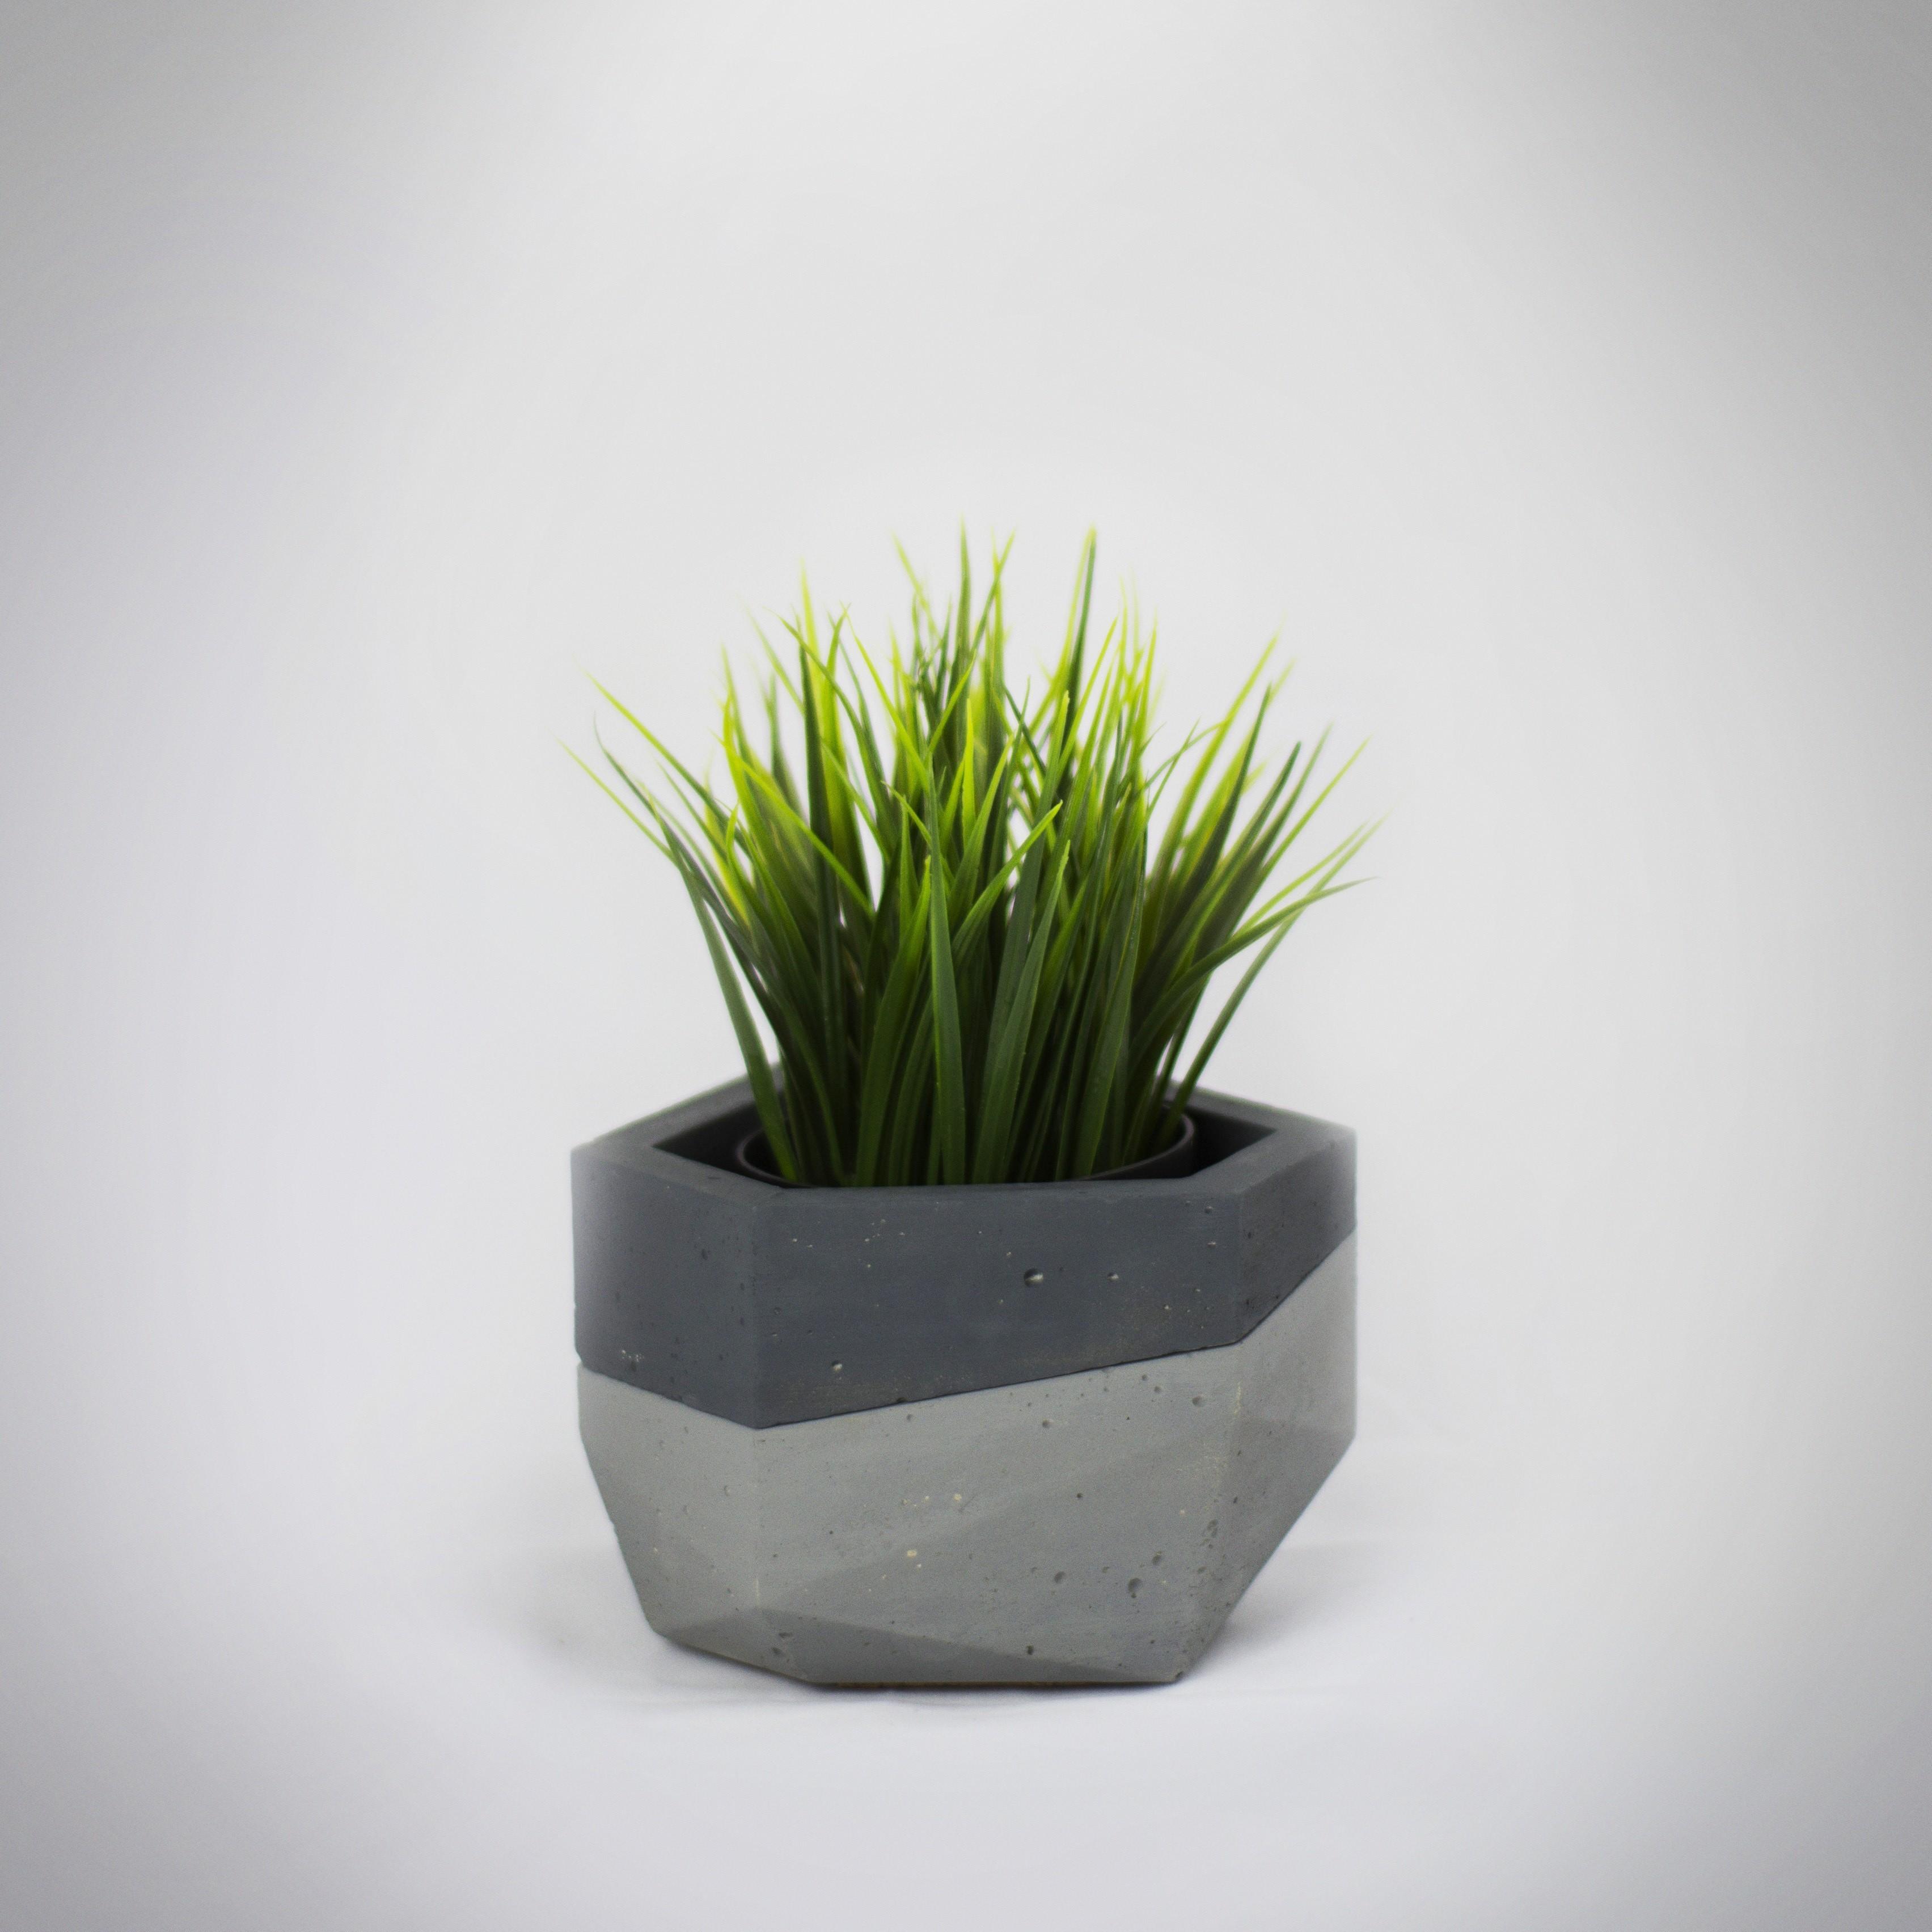 Macetero 5 insta.jpg Download free STL file Concrete Planters Mold • 3D print model, dukedoks